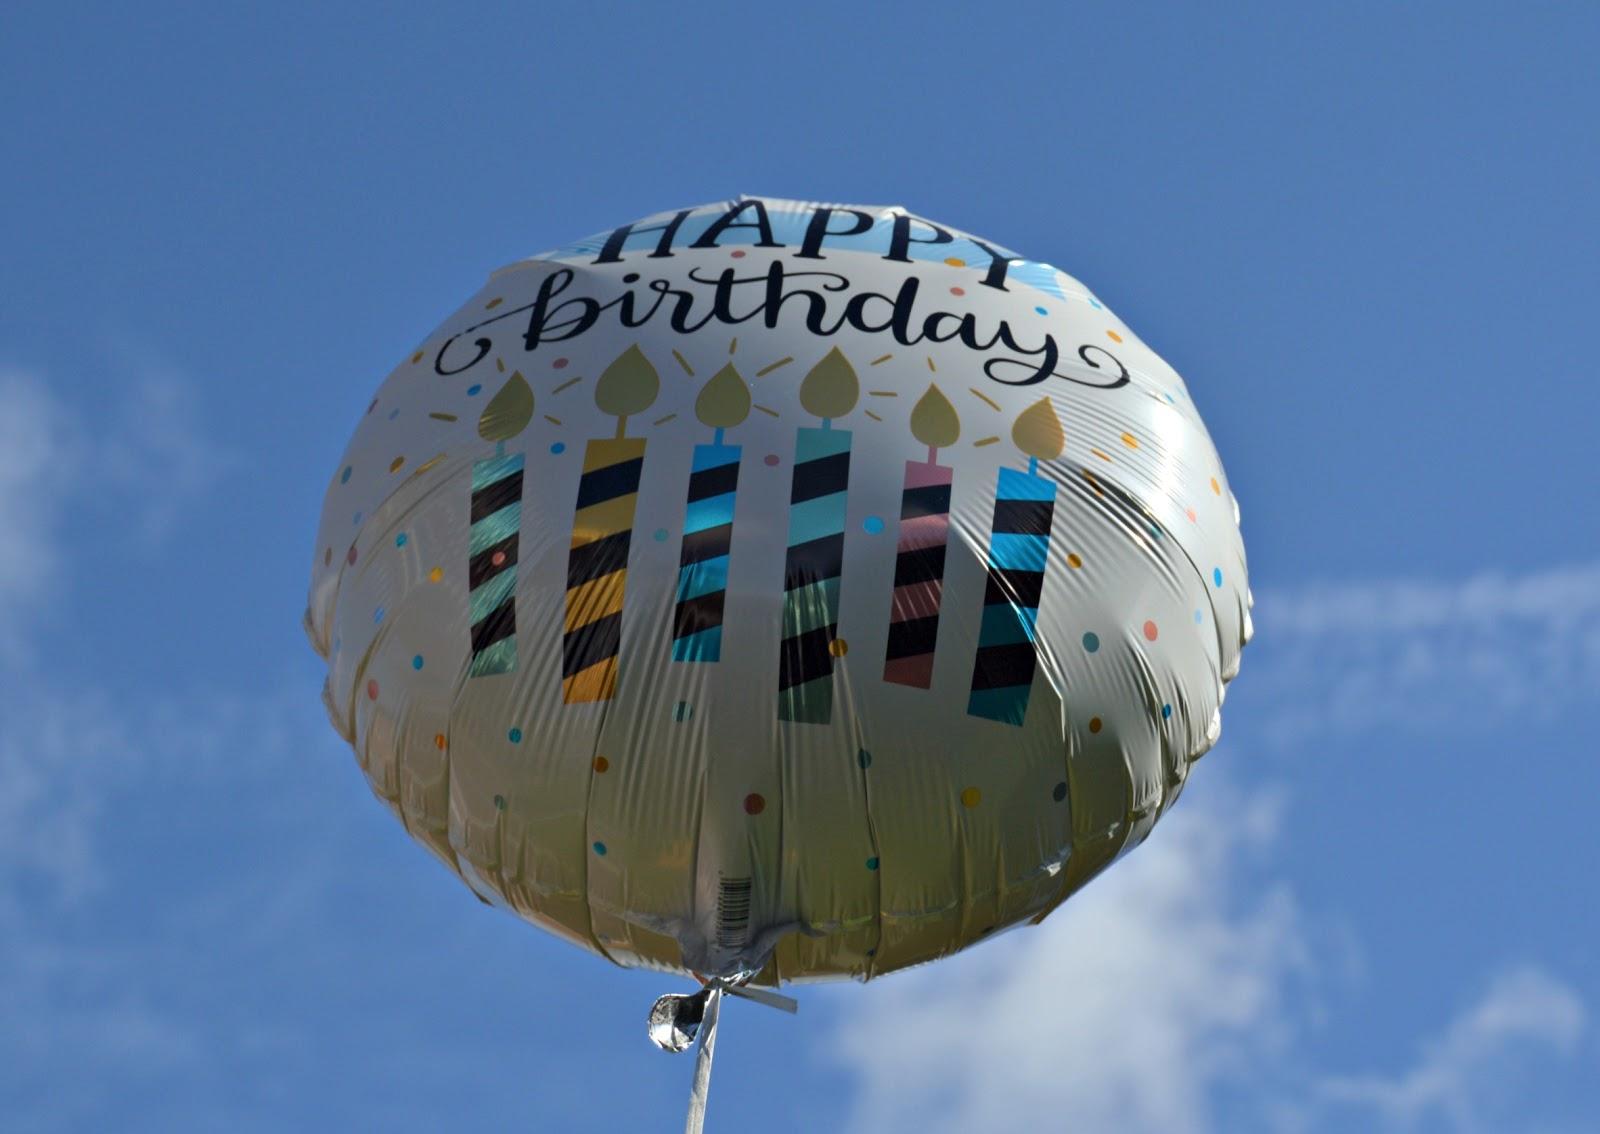 Moonpig Happy Birthday Balloon